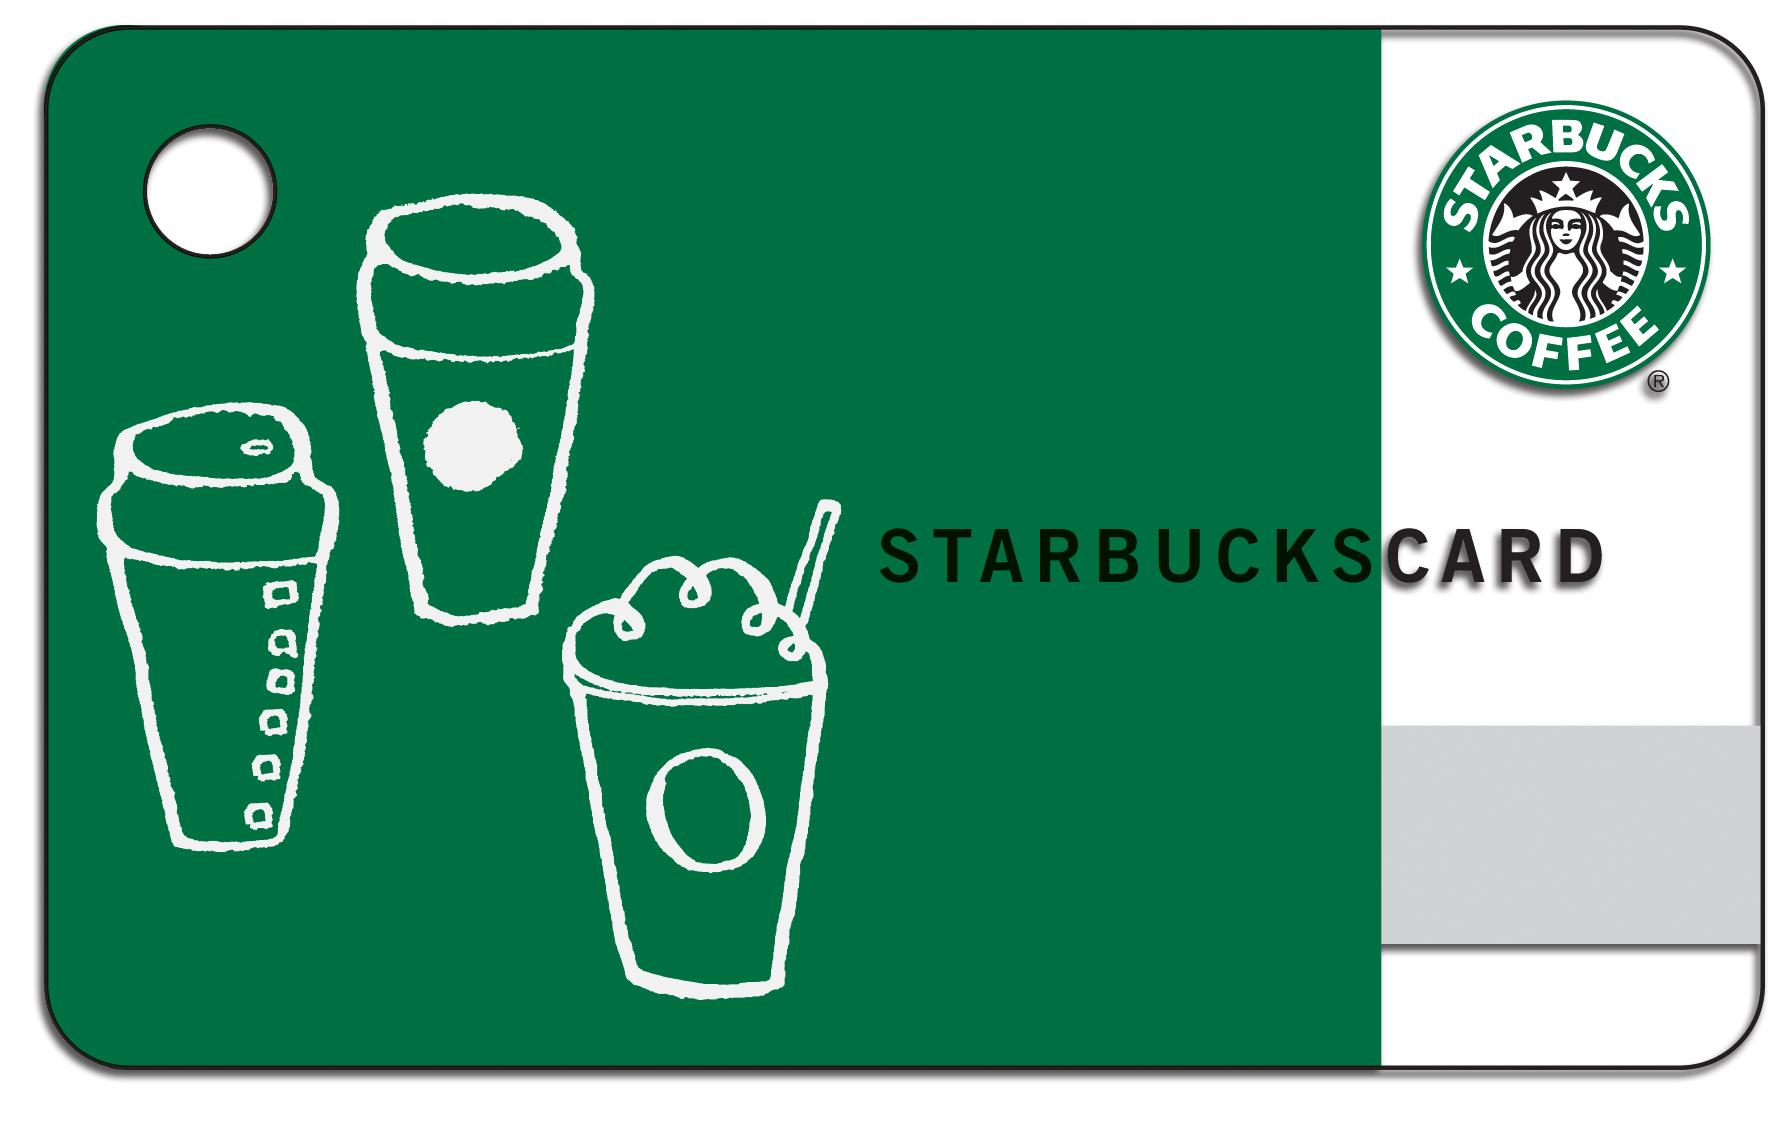 $15 Starbucks Gift Card Giveaway – Open WW